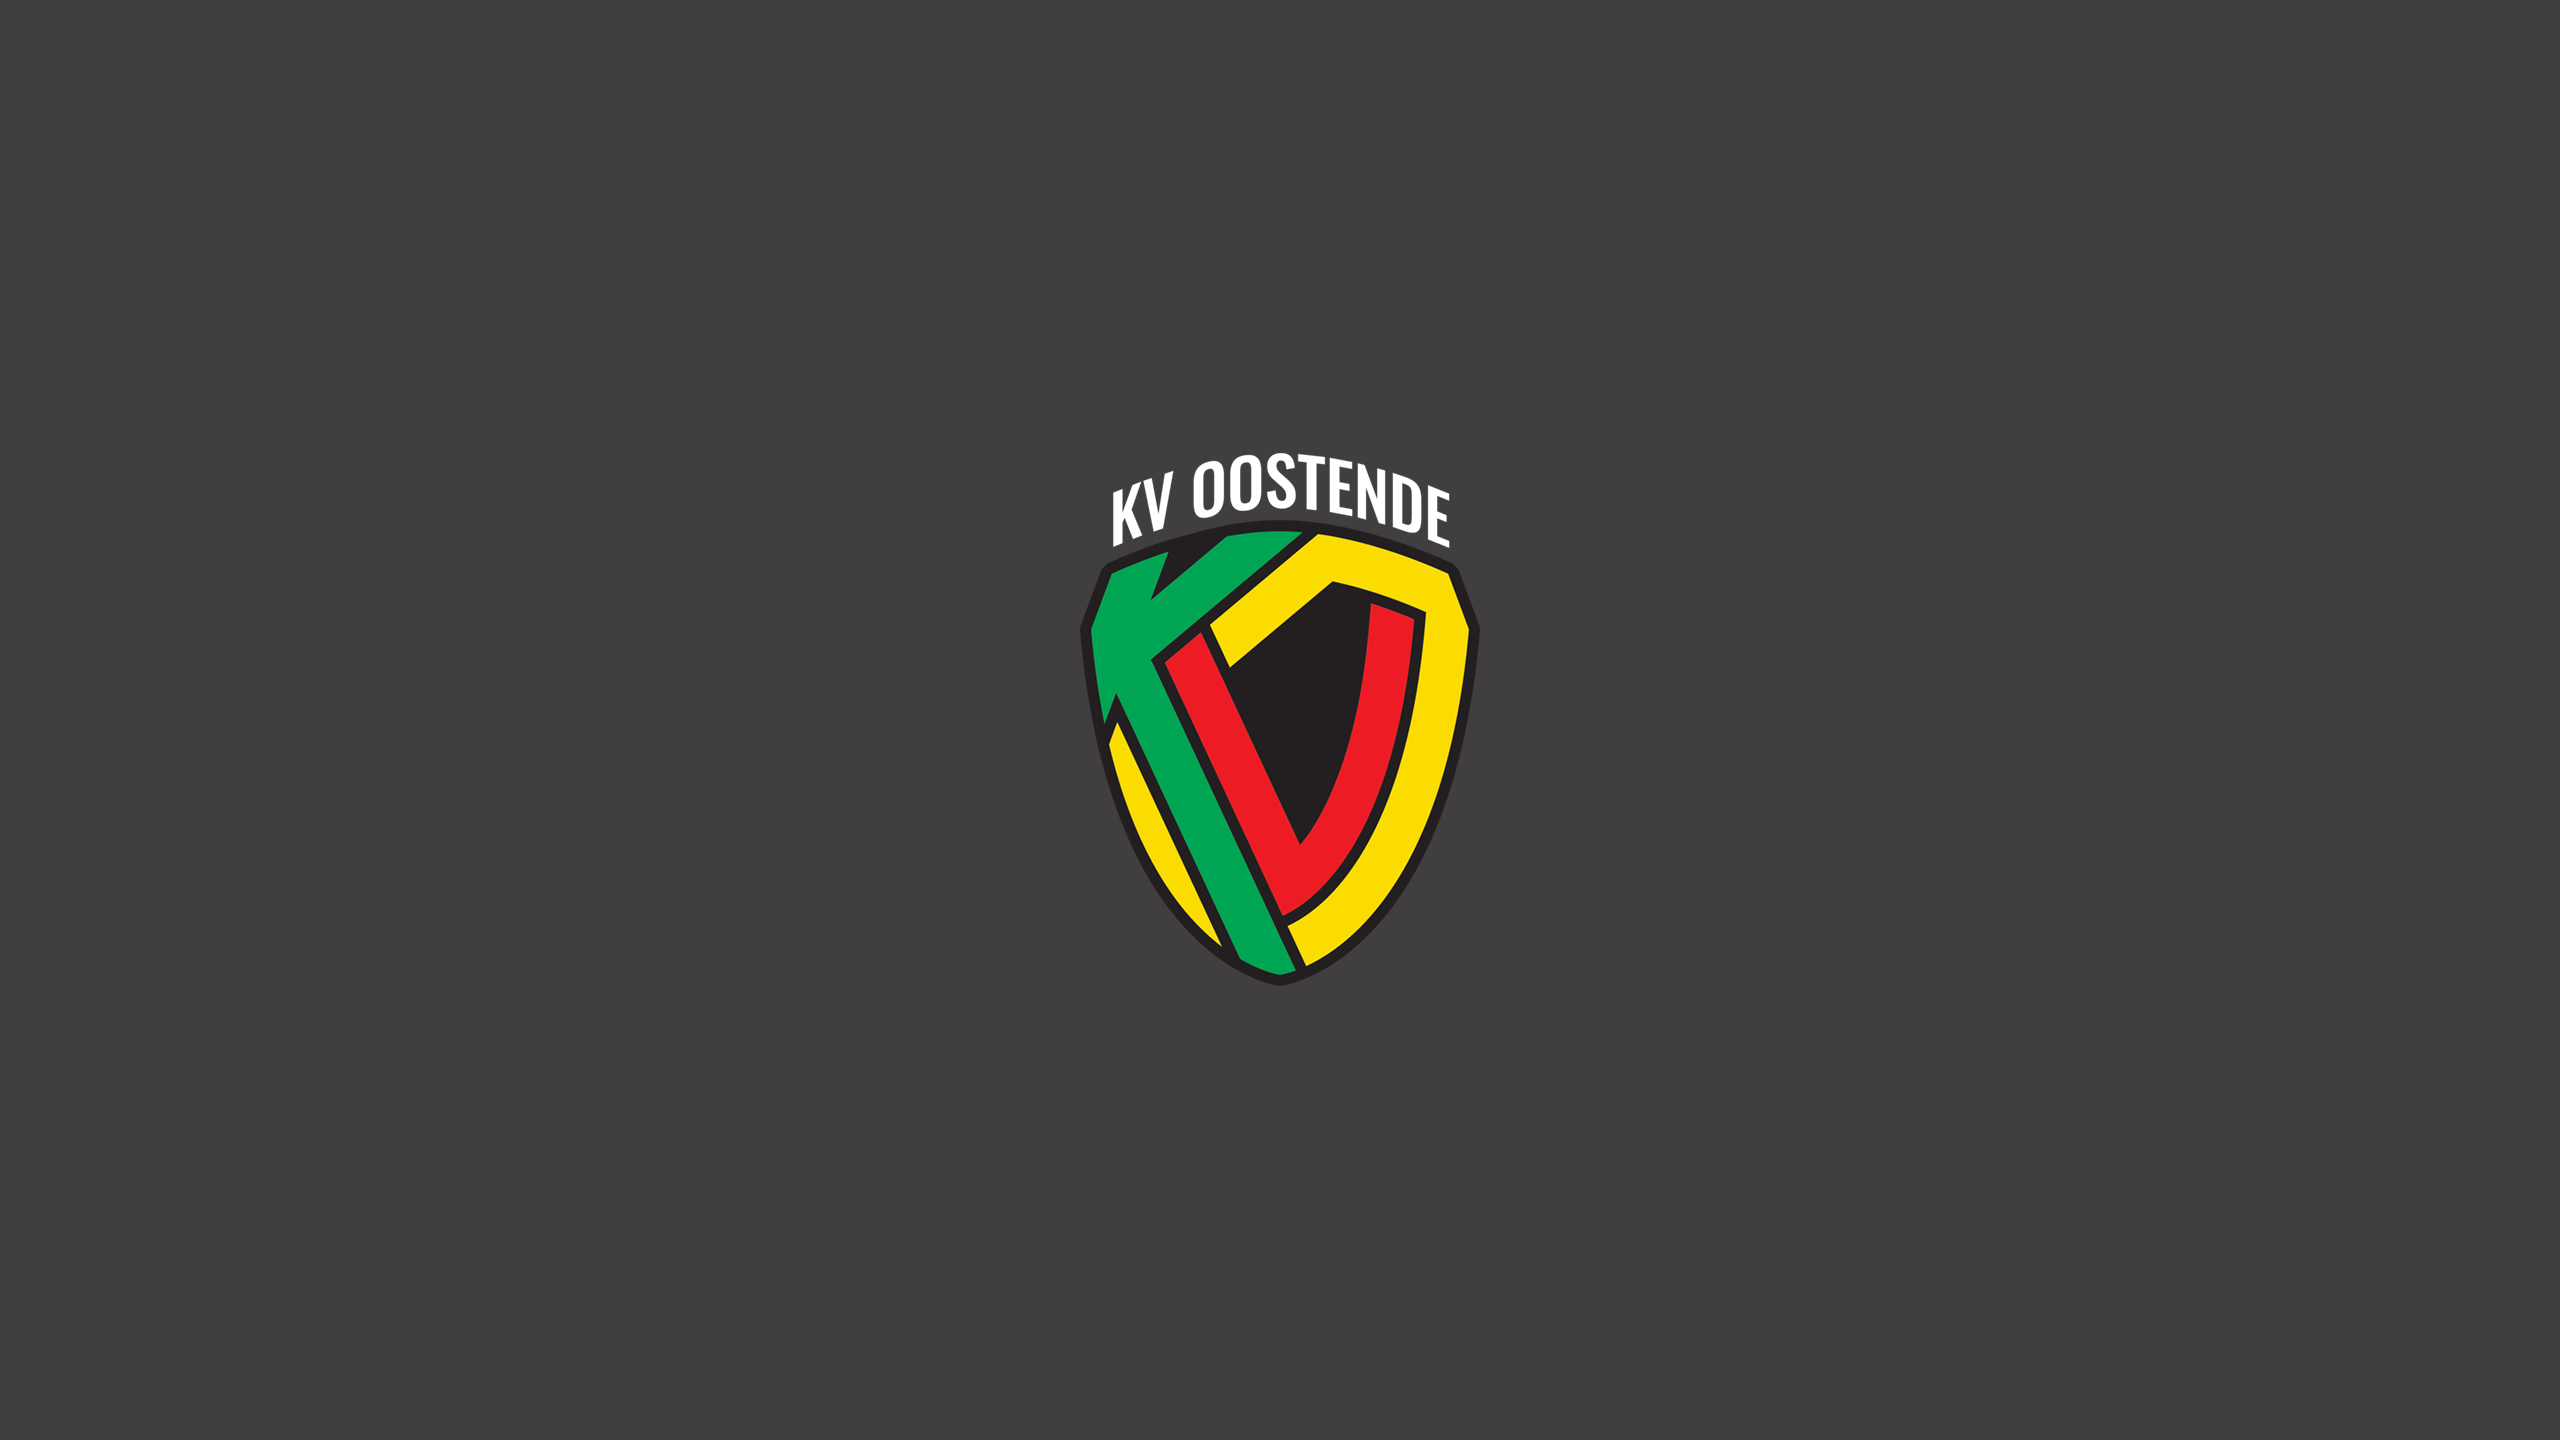 KV Oostende (Away)